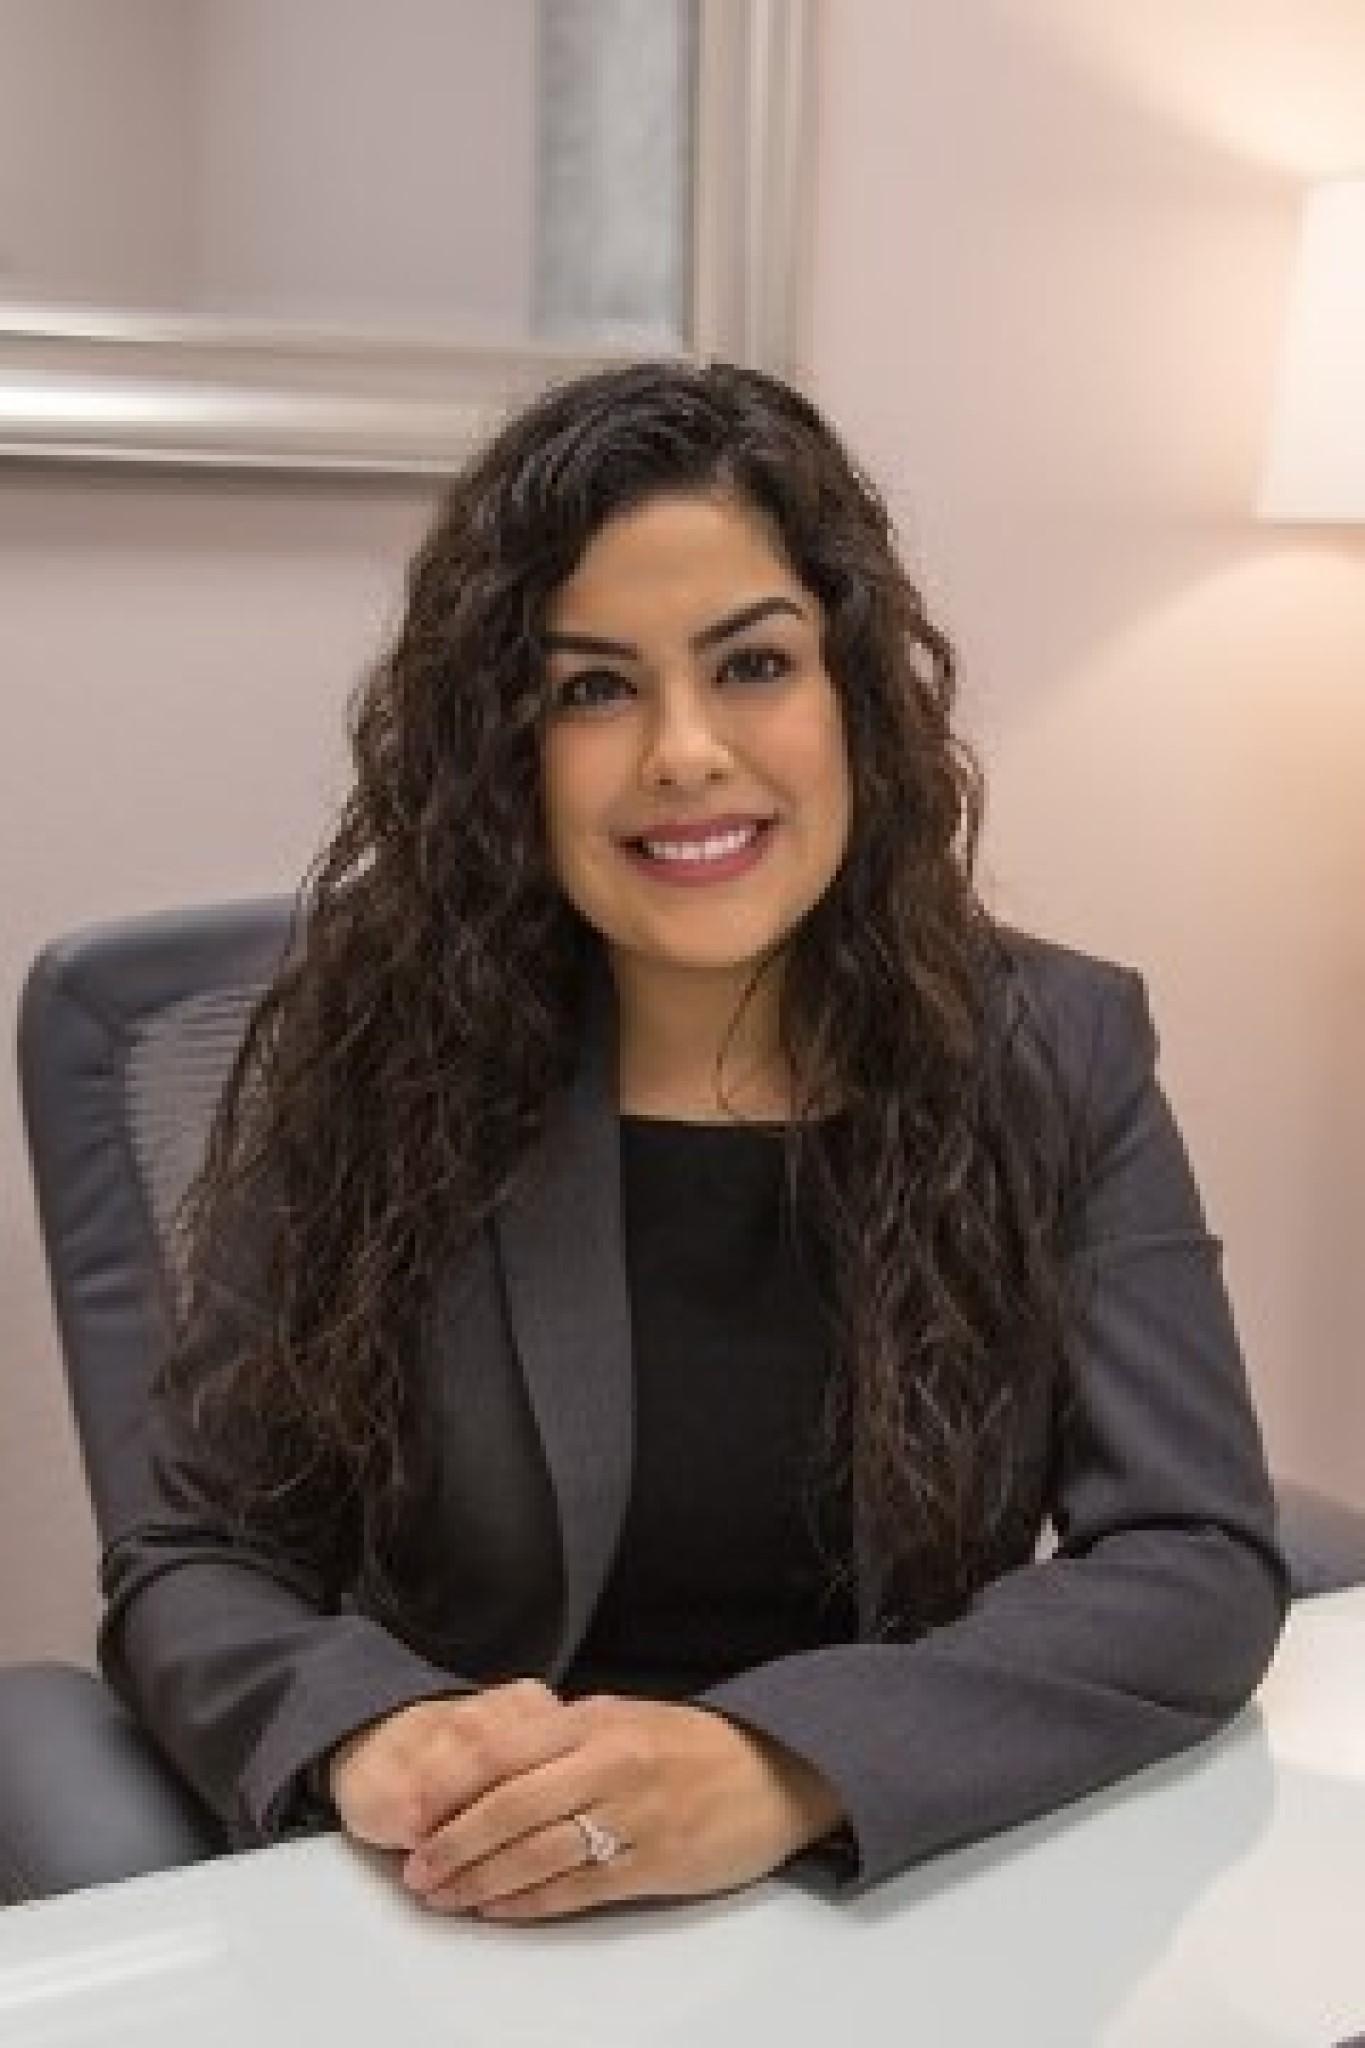 Elvira Villareal